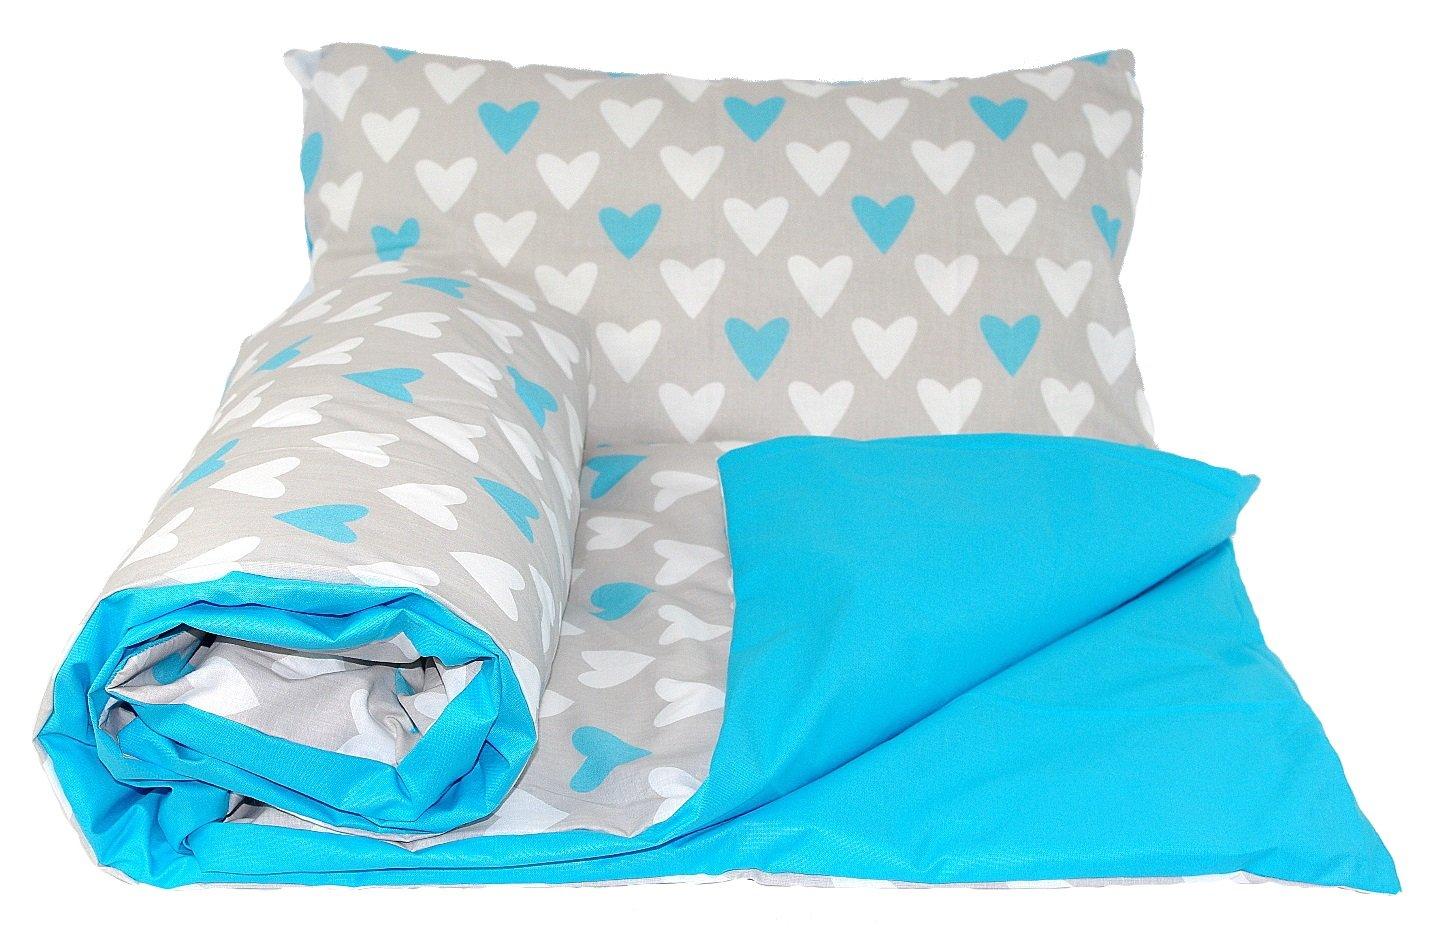 150x120cm for junior beds, 21 Babys Comfort REVERSIBLE 2pcs baby bedding set DUVET// QUILT COVER PILLOWCASE